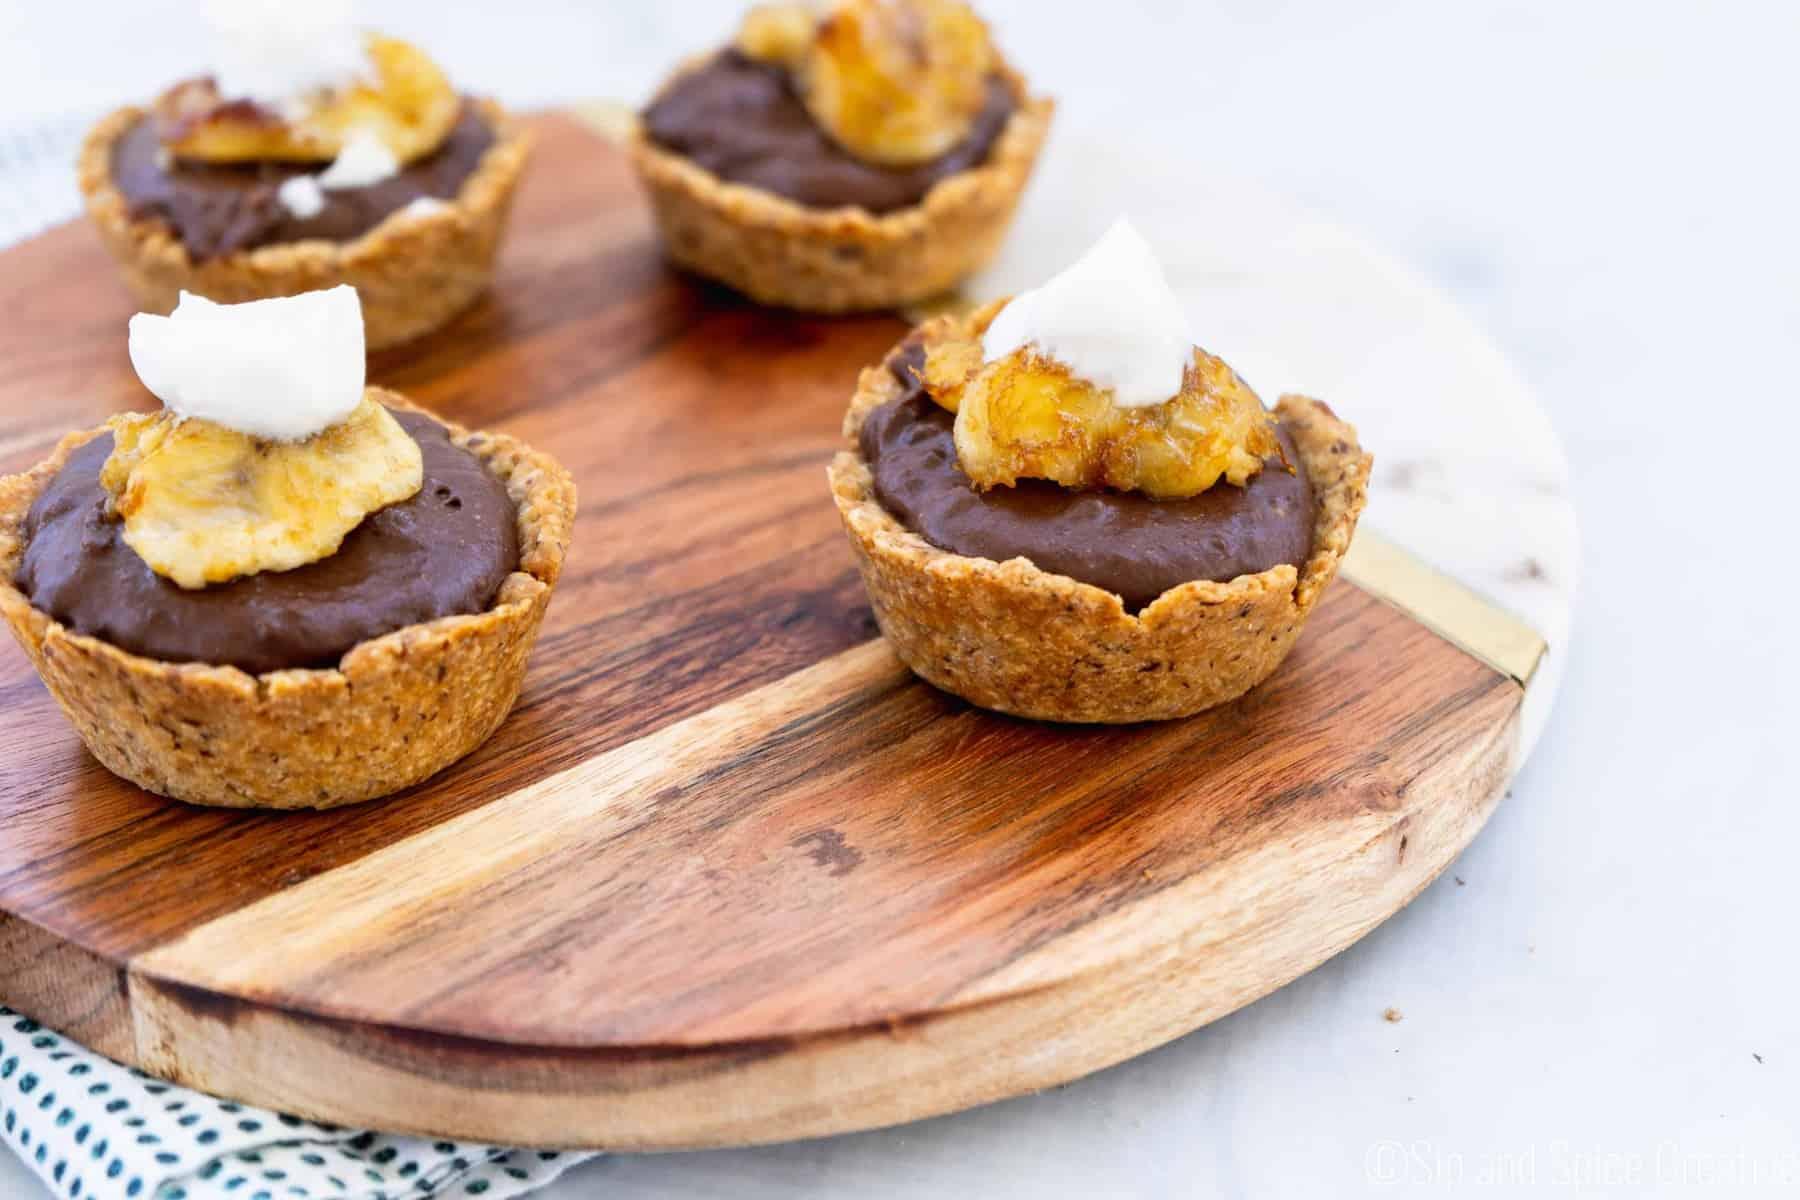 Vegan Chocolate Banana Tarts